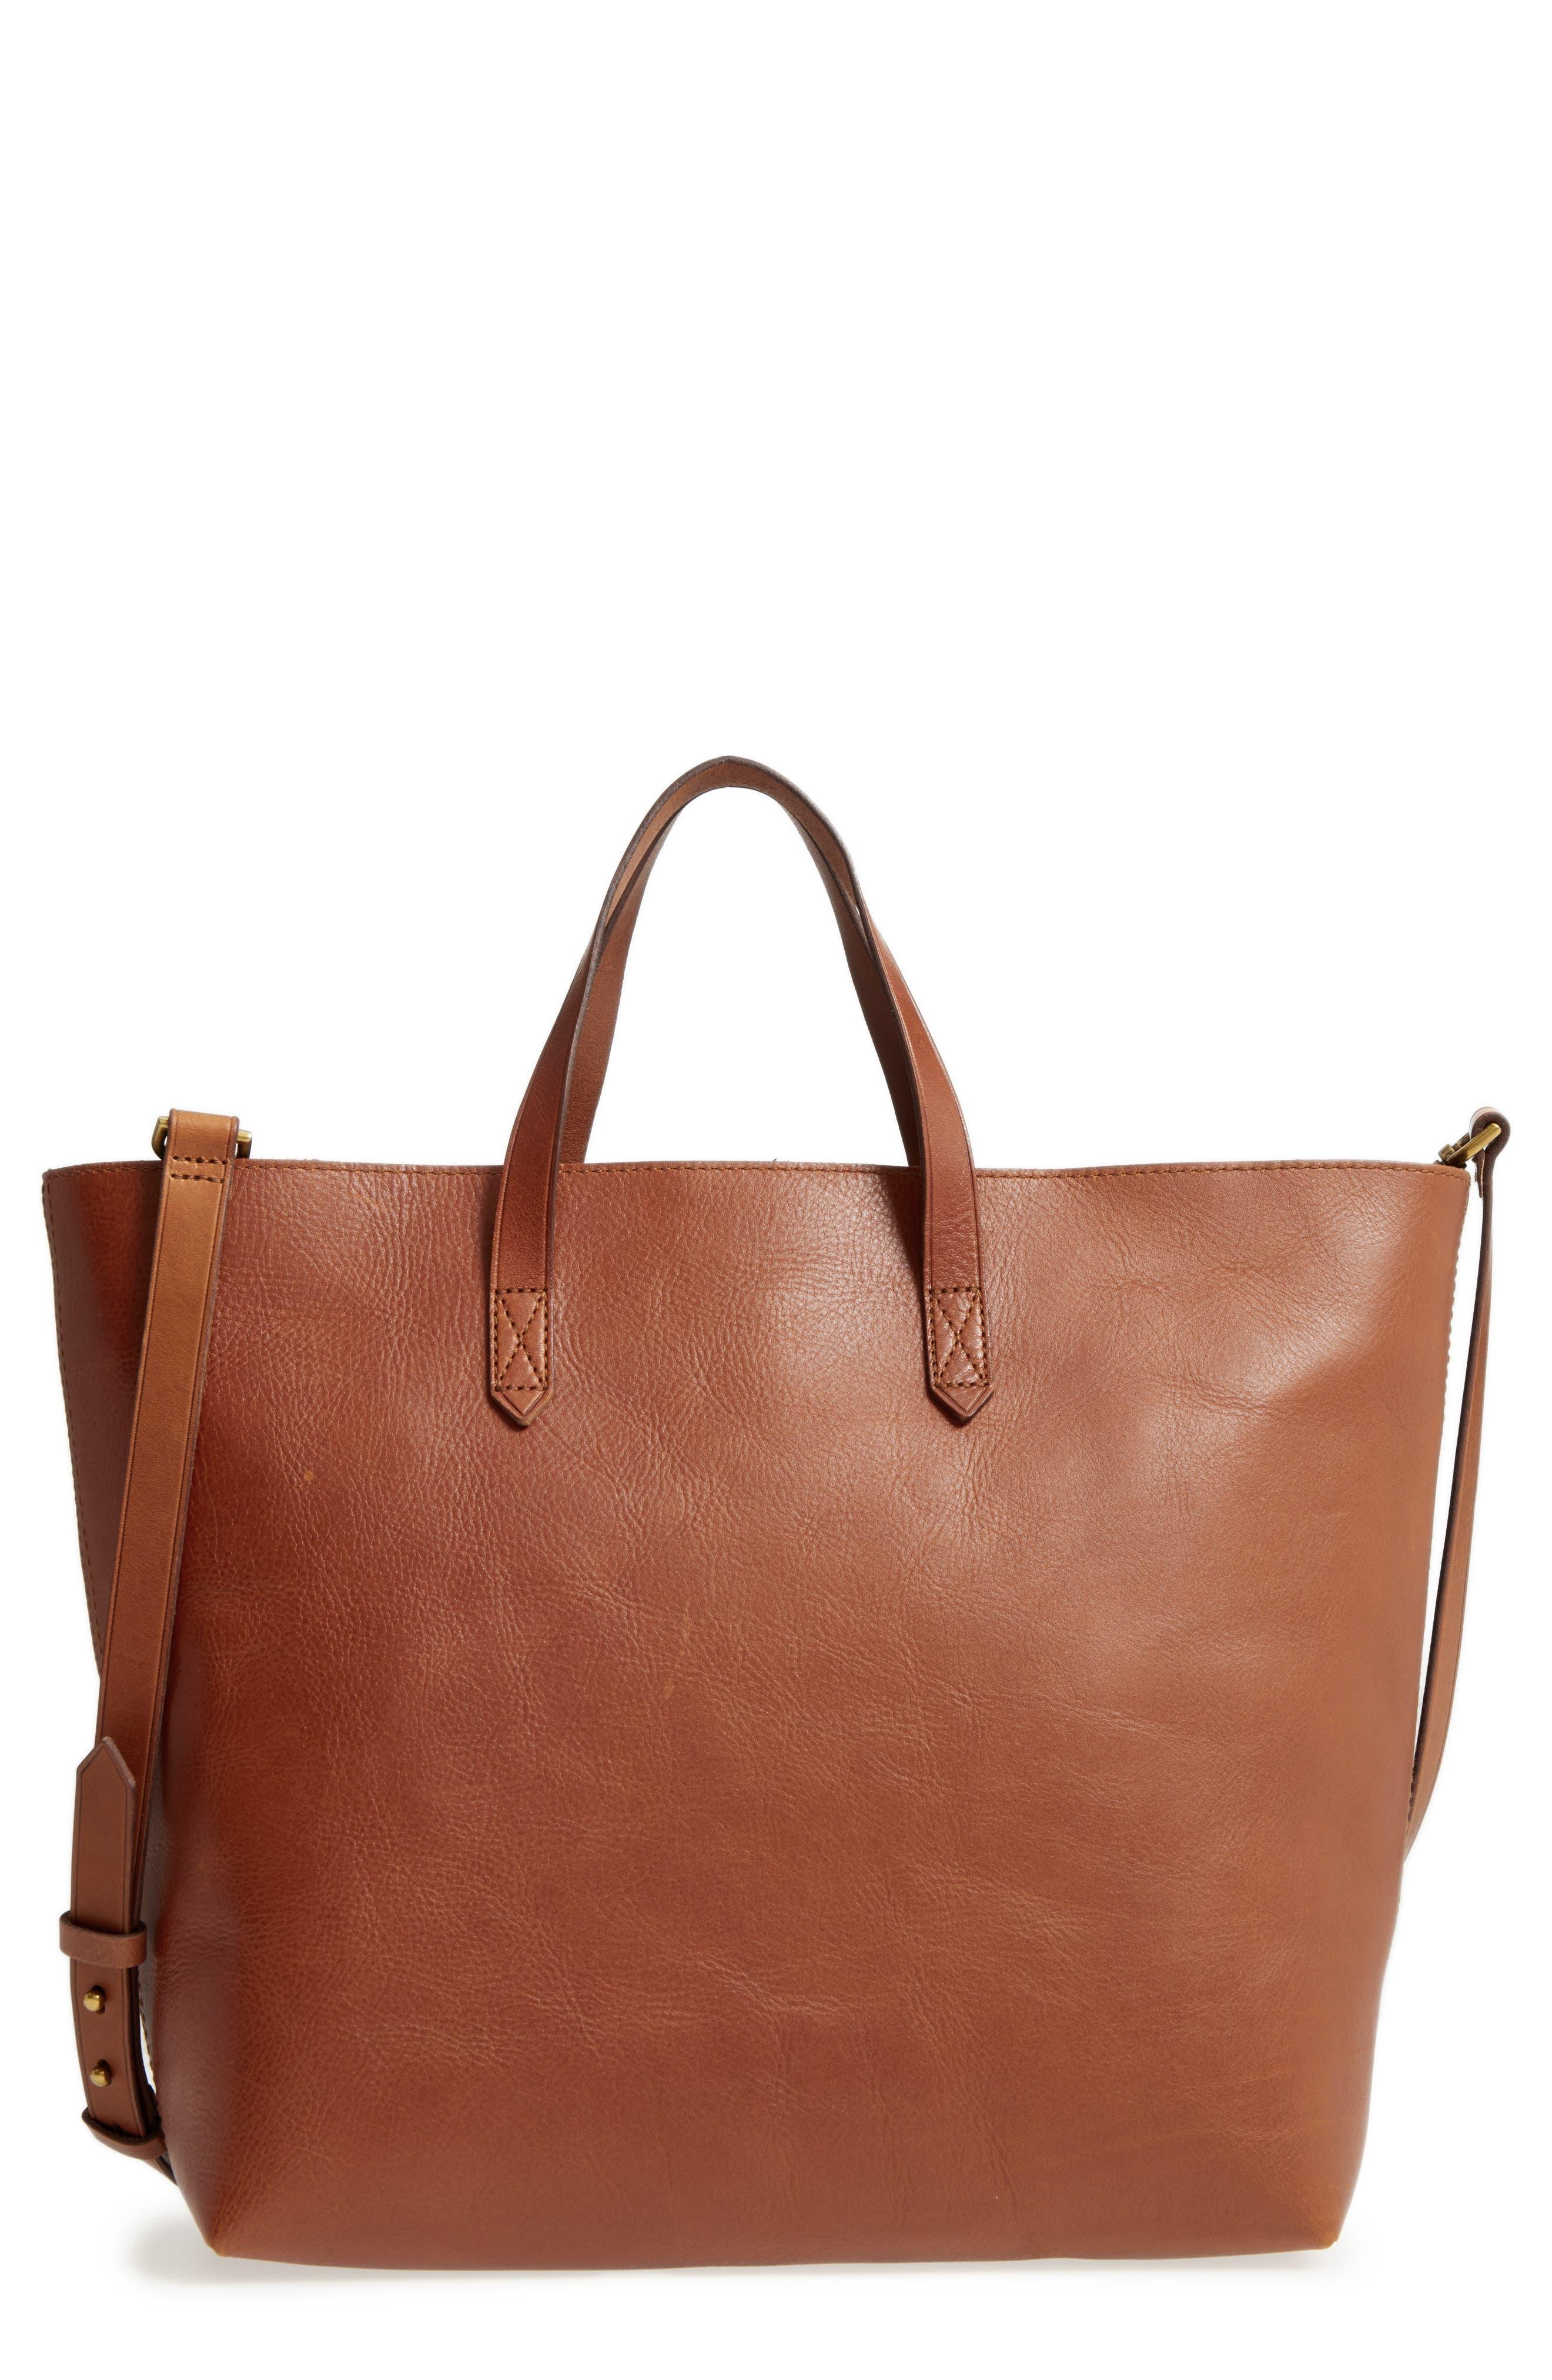 3f35d549fa8 Madewell Handbags & Purses | Nordstrom